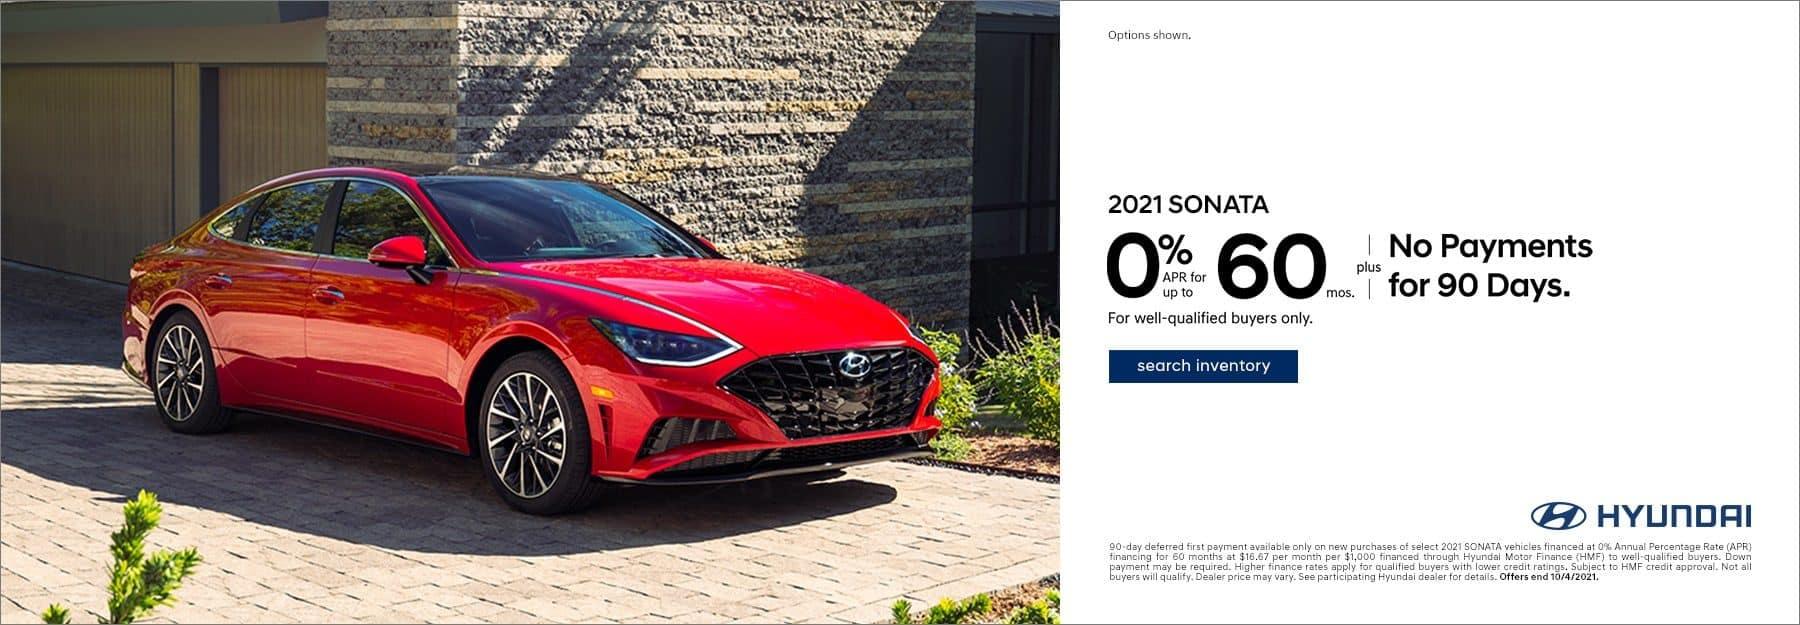 2021 Hyundai Sonata APR offer